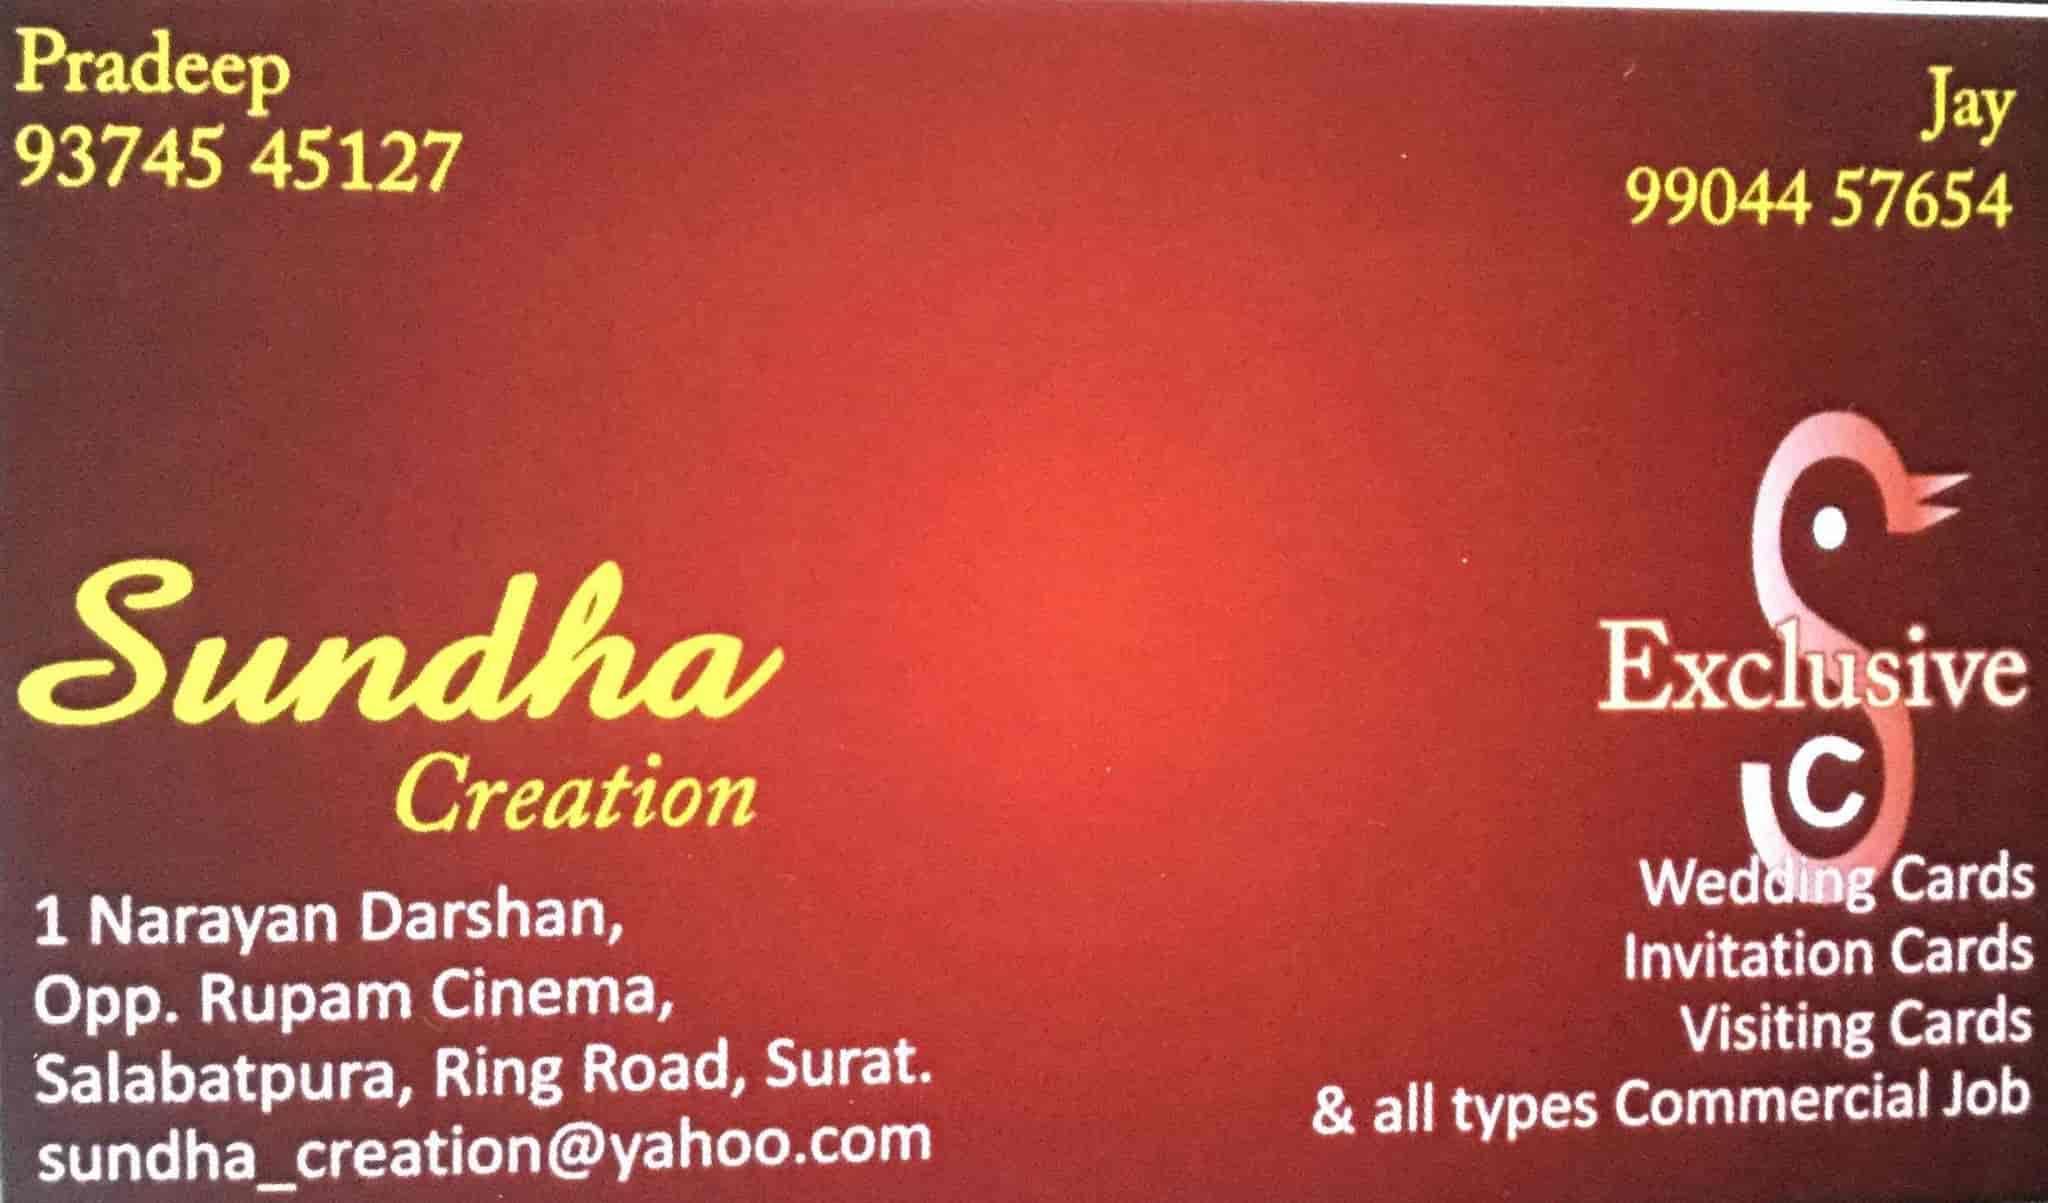 Sundha Creation, Salabatpura - Printing Press in Surat - Justdial